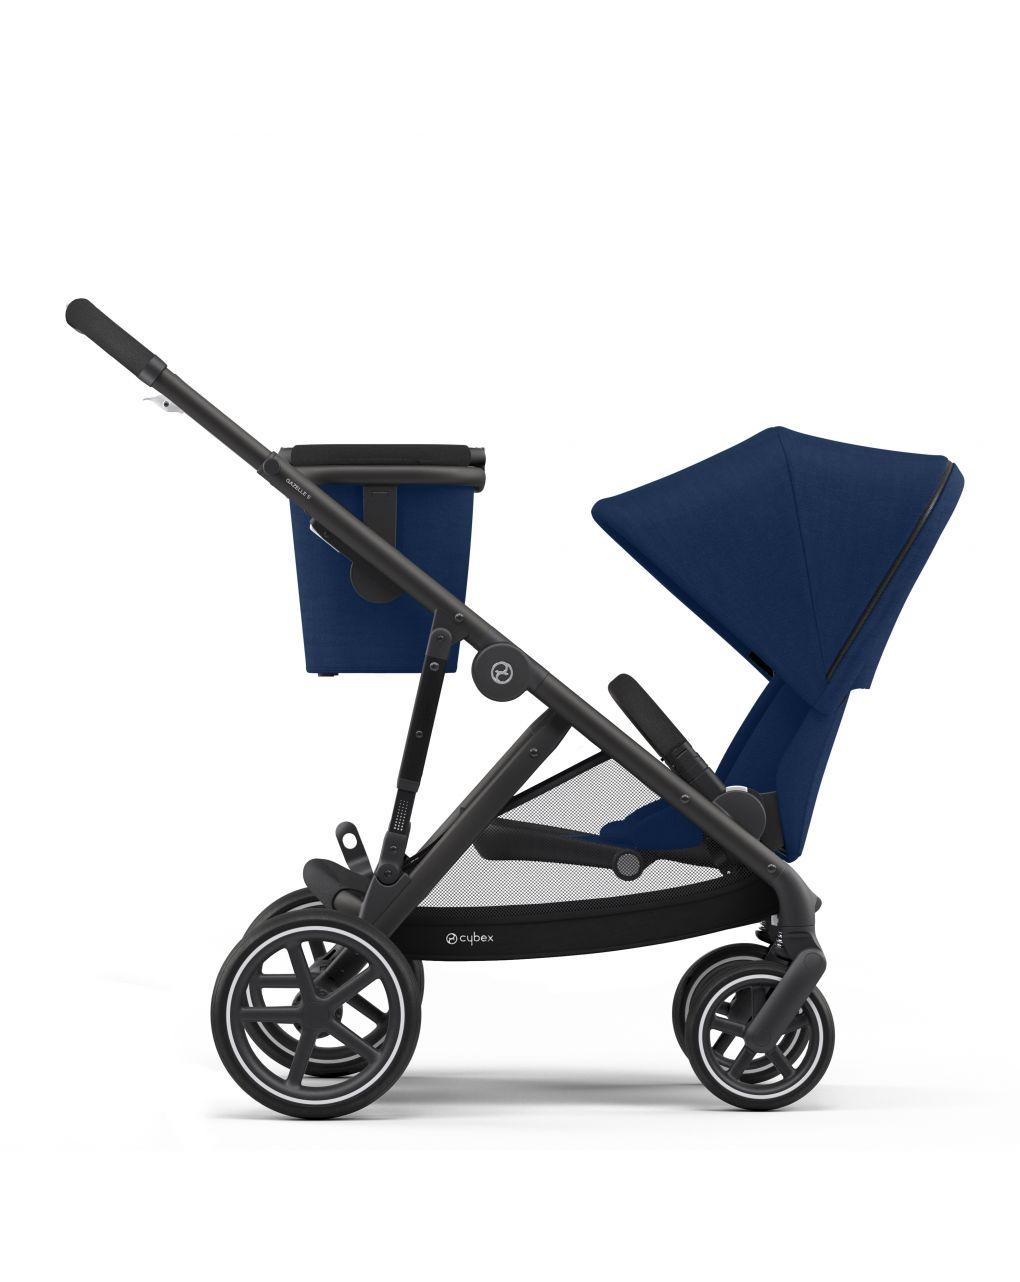 Cybex Gazelle S Βρεφικό Καρότσι - Μπλε - Black Frame